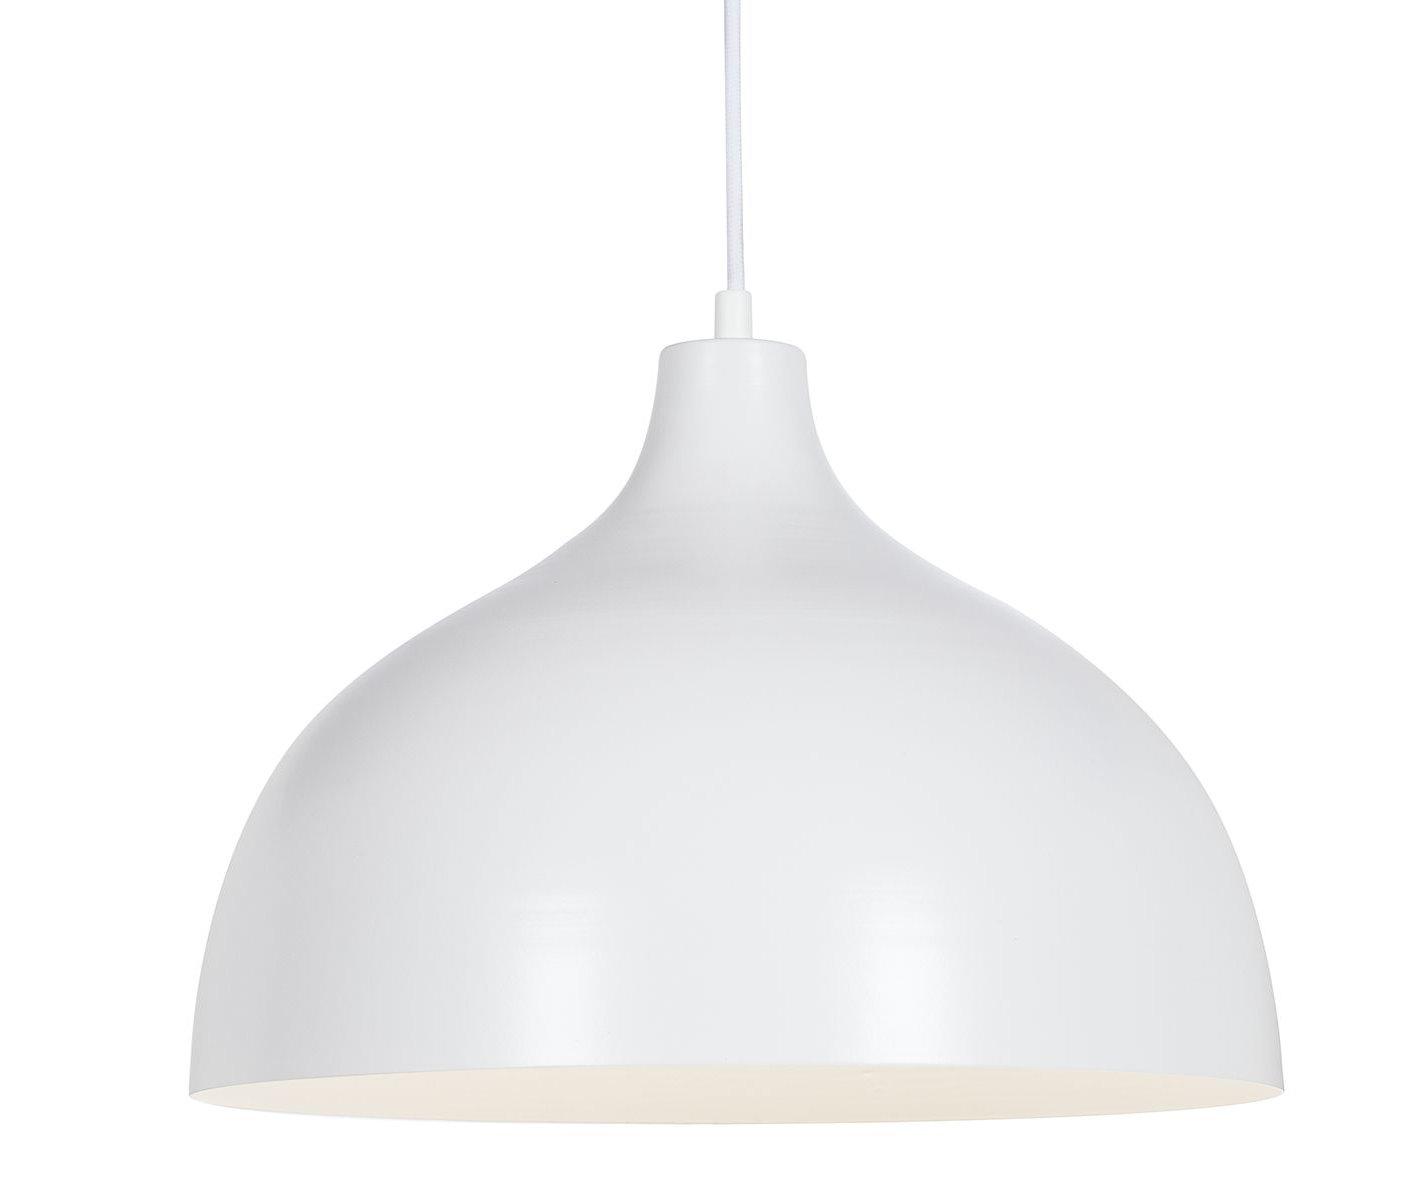 metall pendelleuchte 36cm lampe leuchte h ngelampe deckenlampe beleuchtung wei ebay. Black Bedroom Furniture Sets. Home Design Ideas